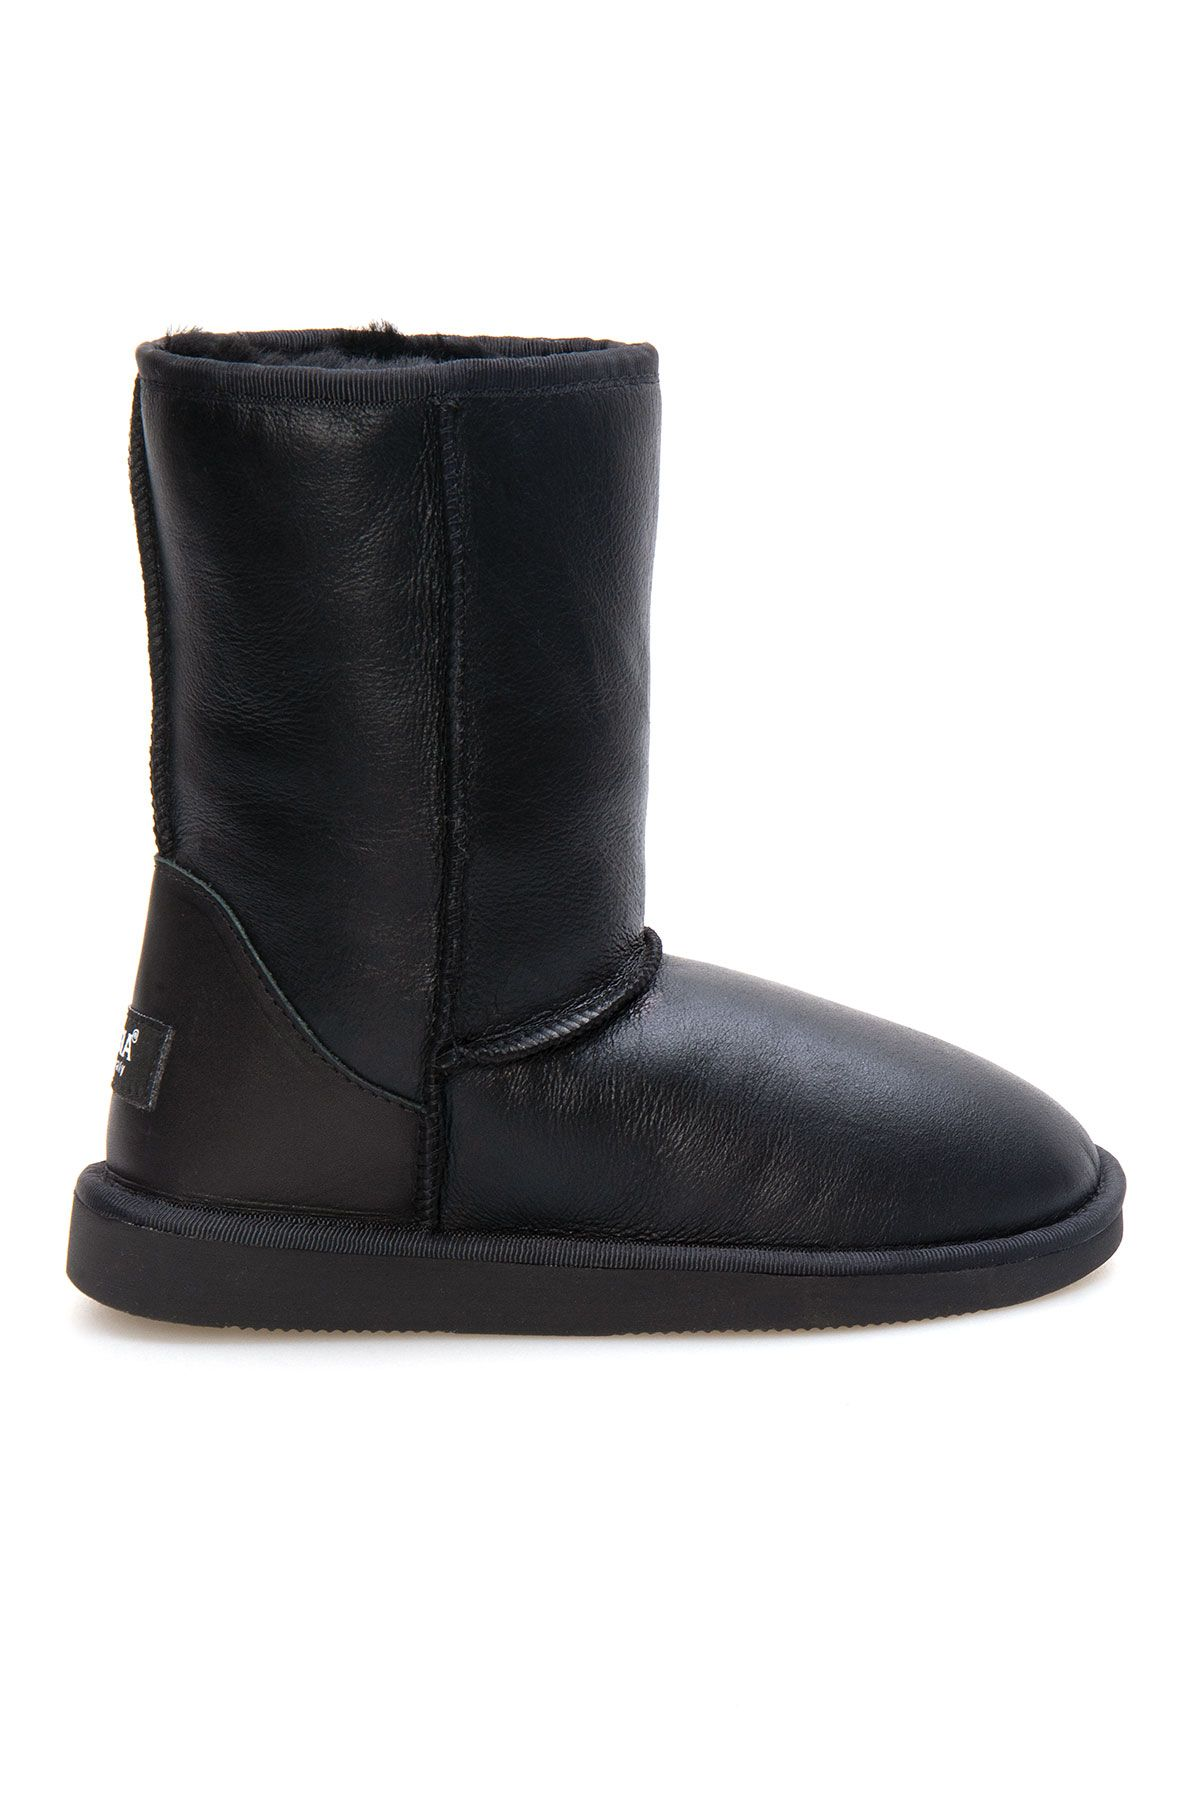 Pegia Shearling Women's Boots 191077 Black